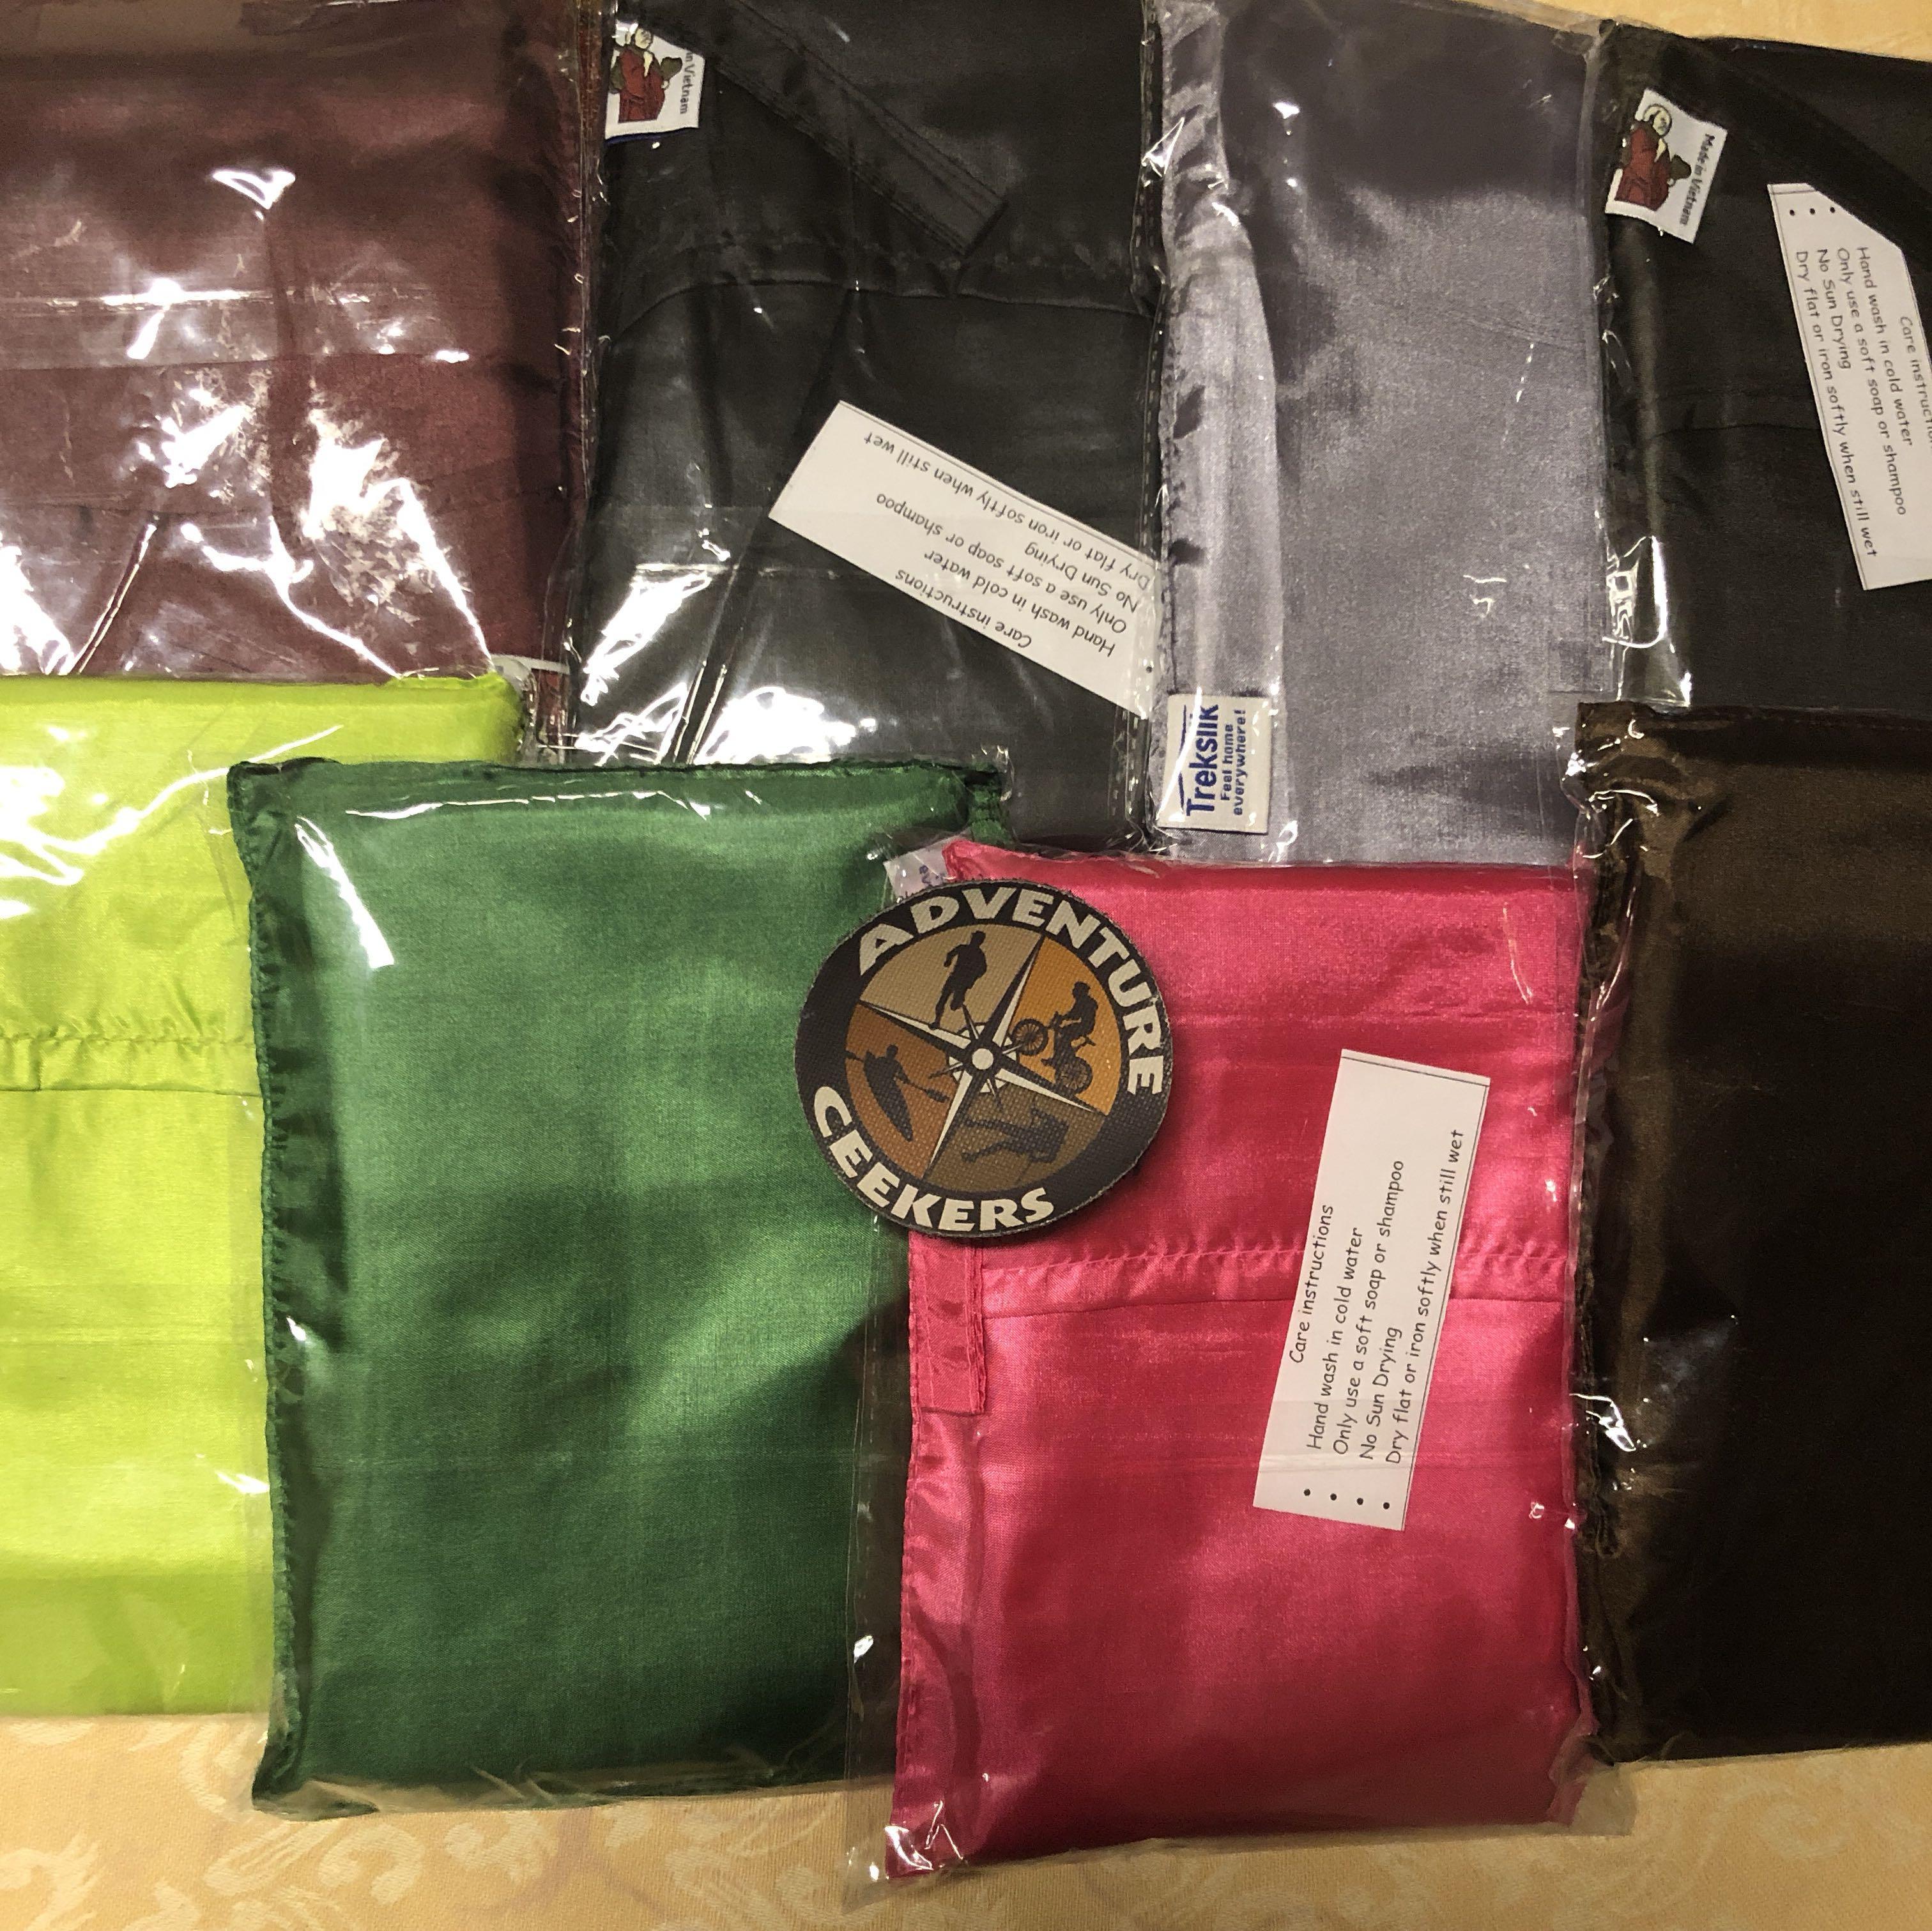 BN Treksilk sleeping bag liner